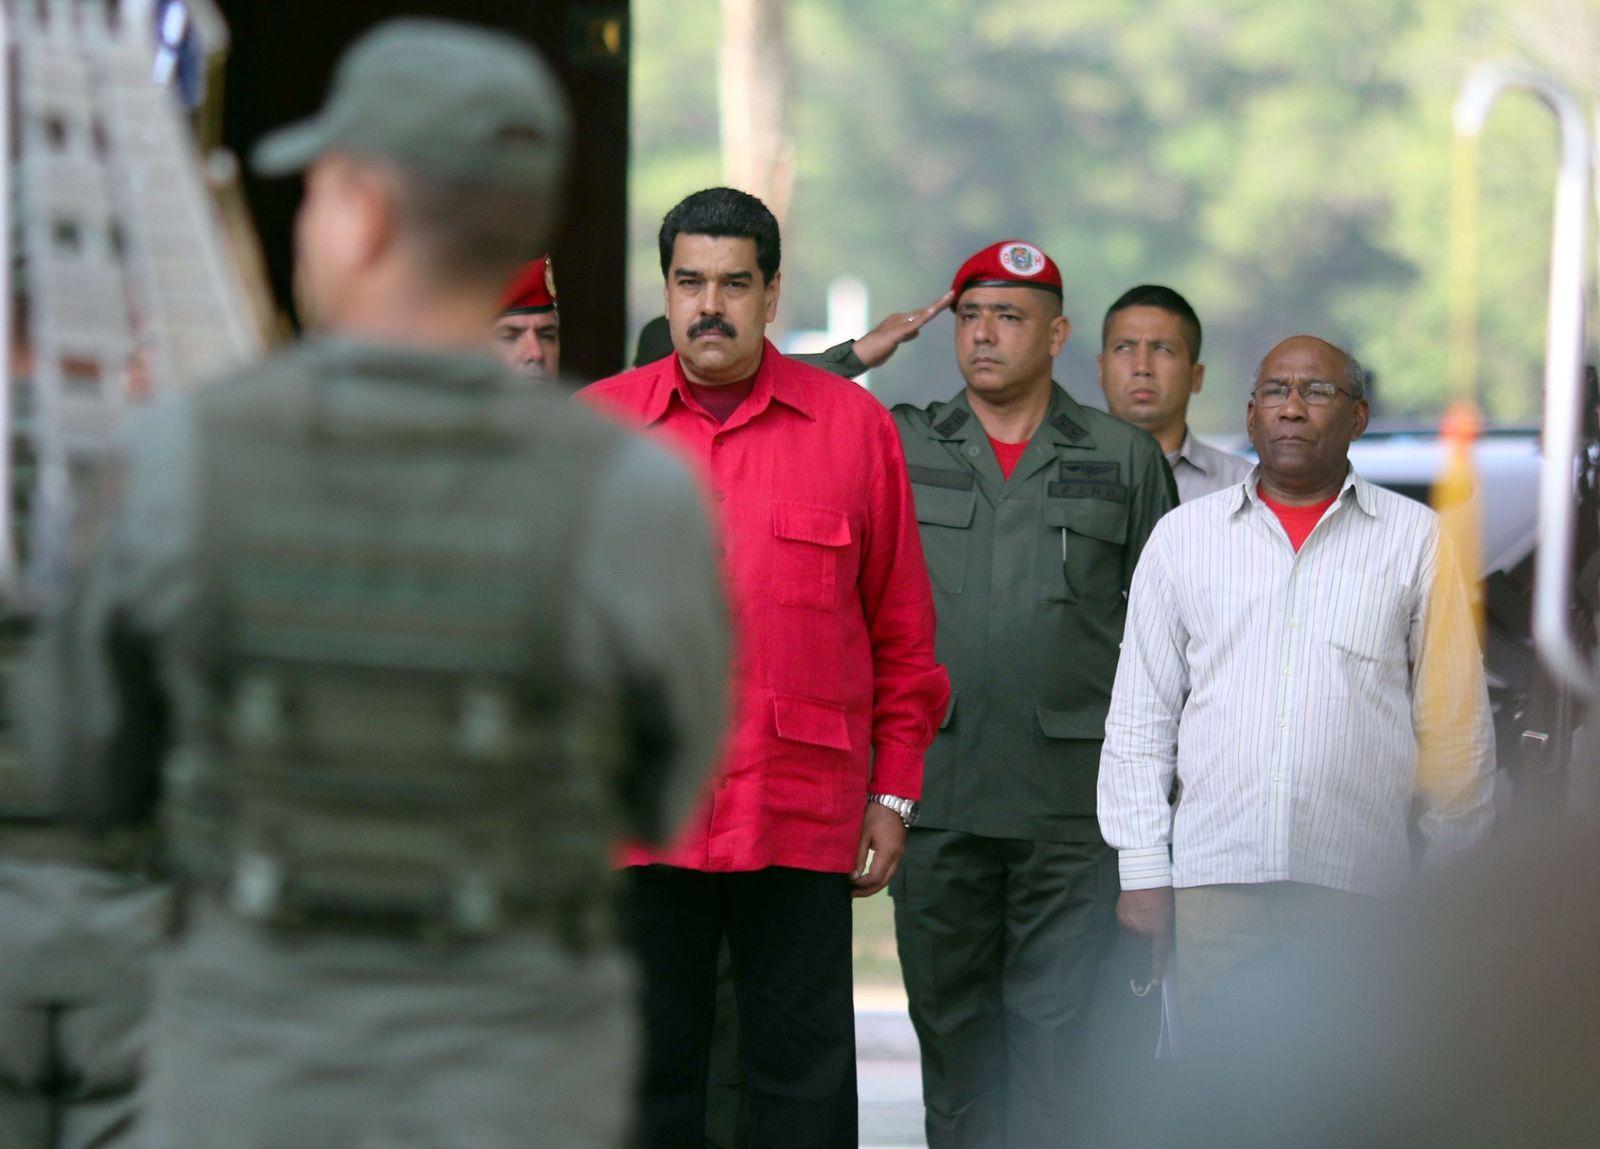 VENEZUELA-POLITCS-MADURO